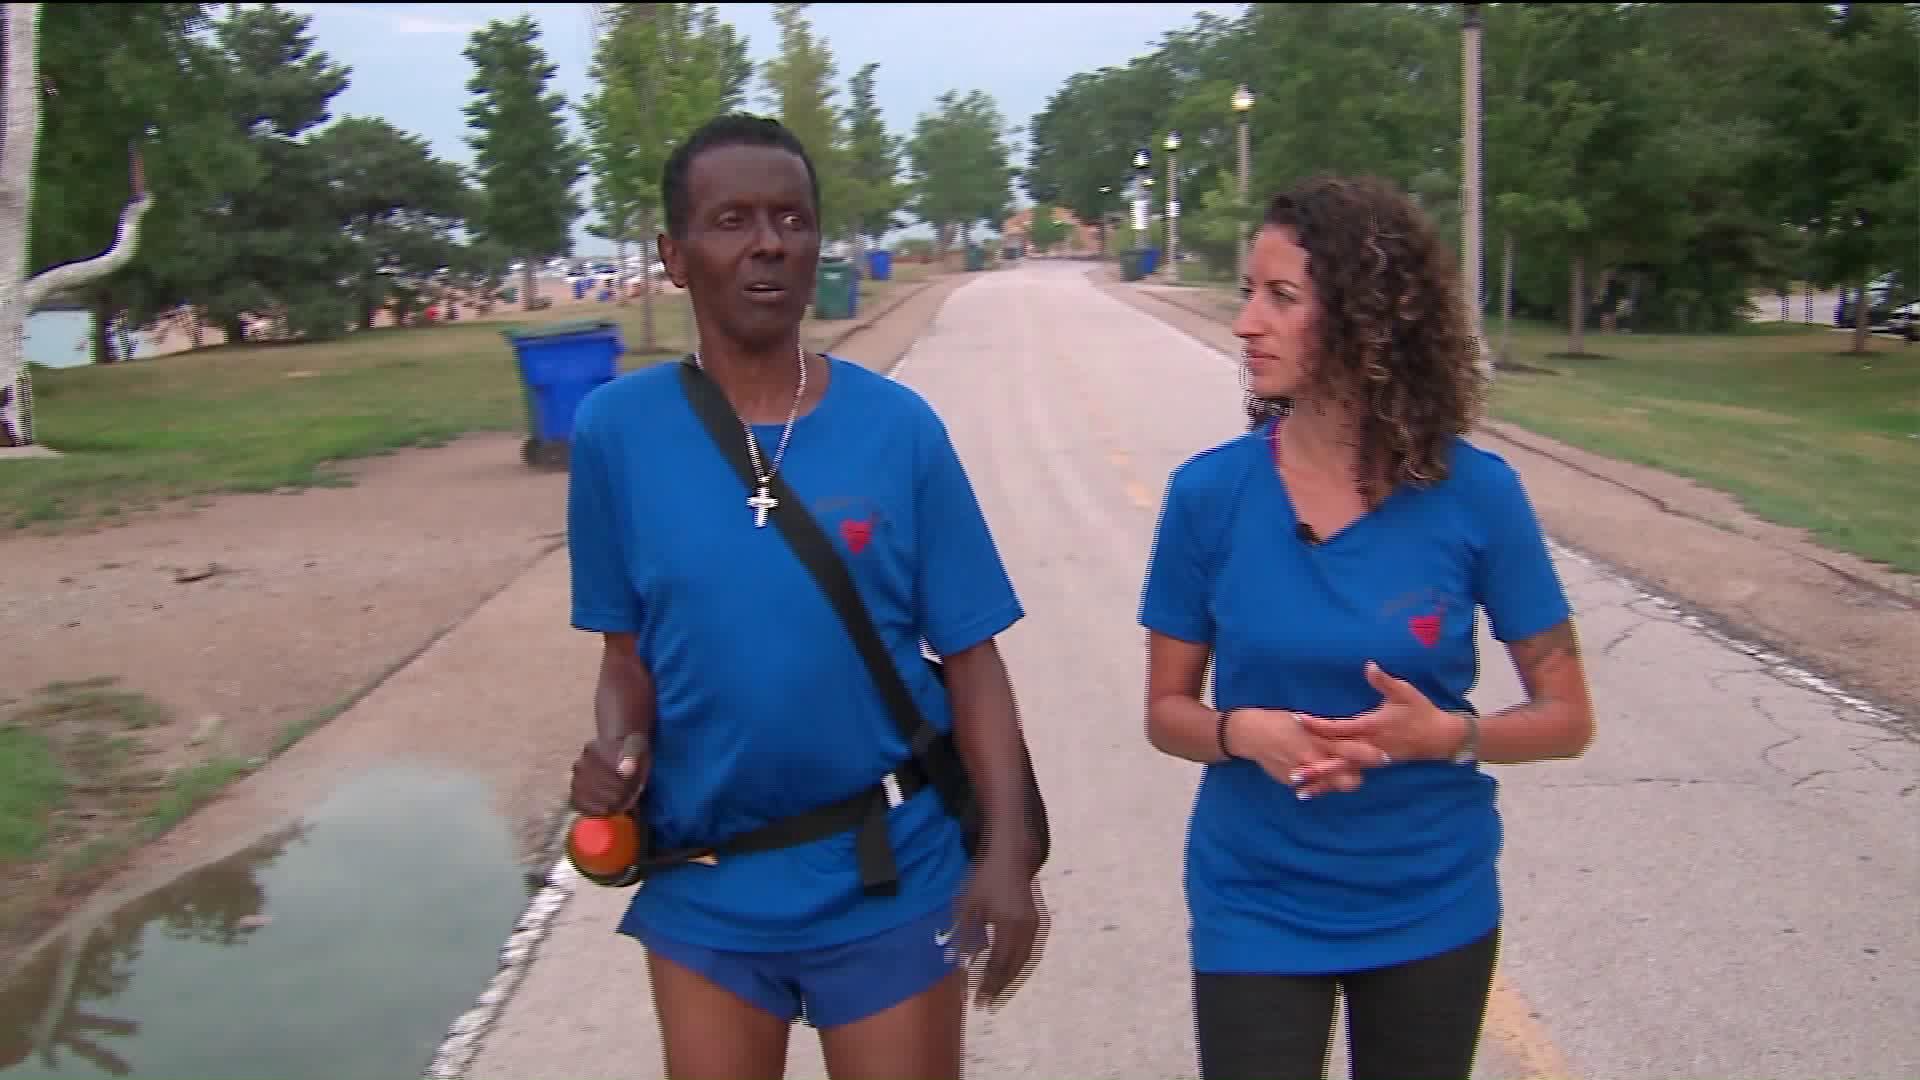 Quadriplegic Man Defies the Odds, Plans to Run 20th Marathon